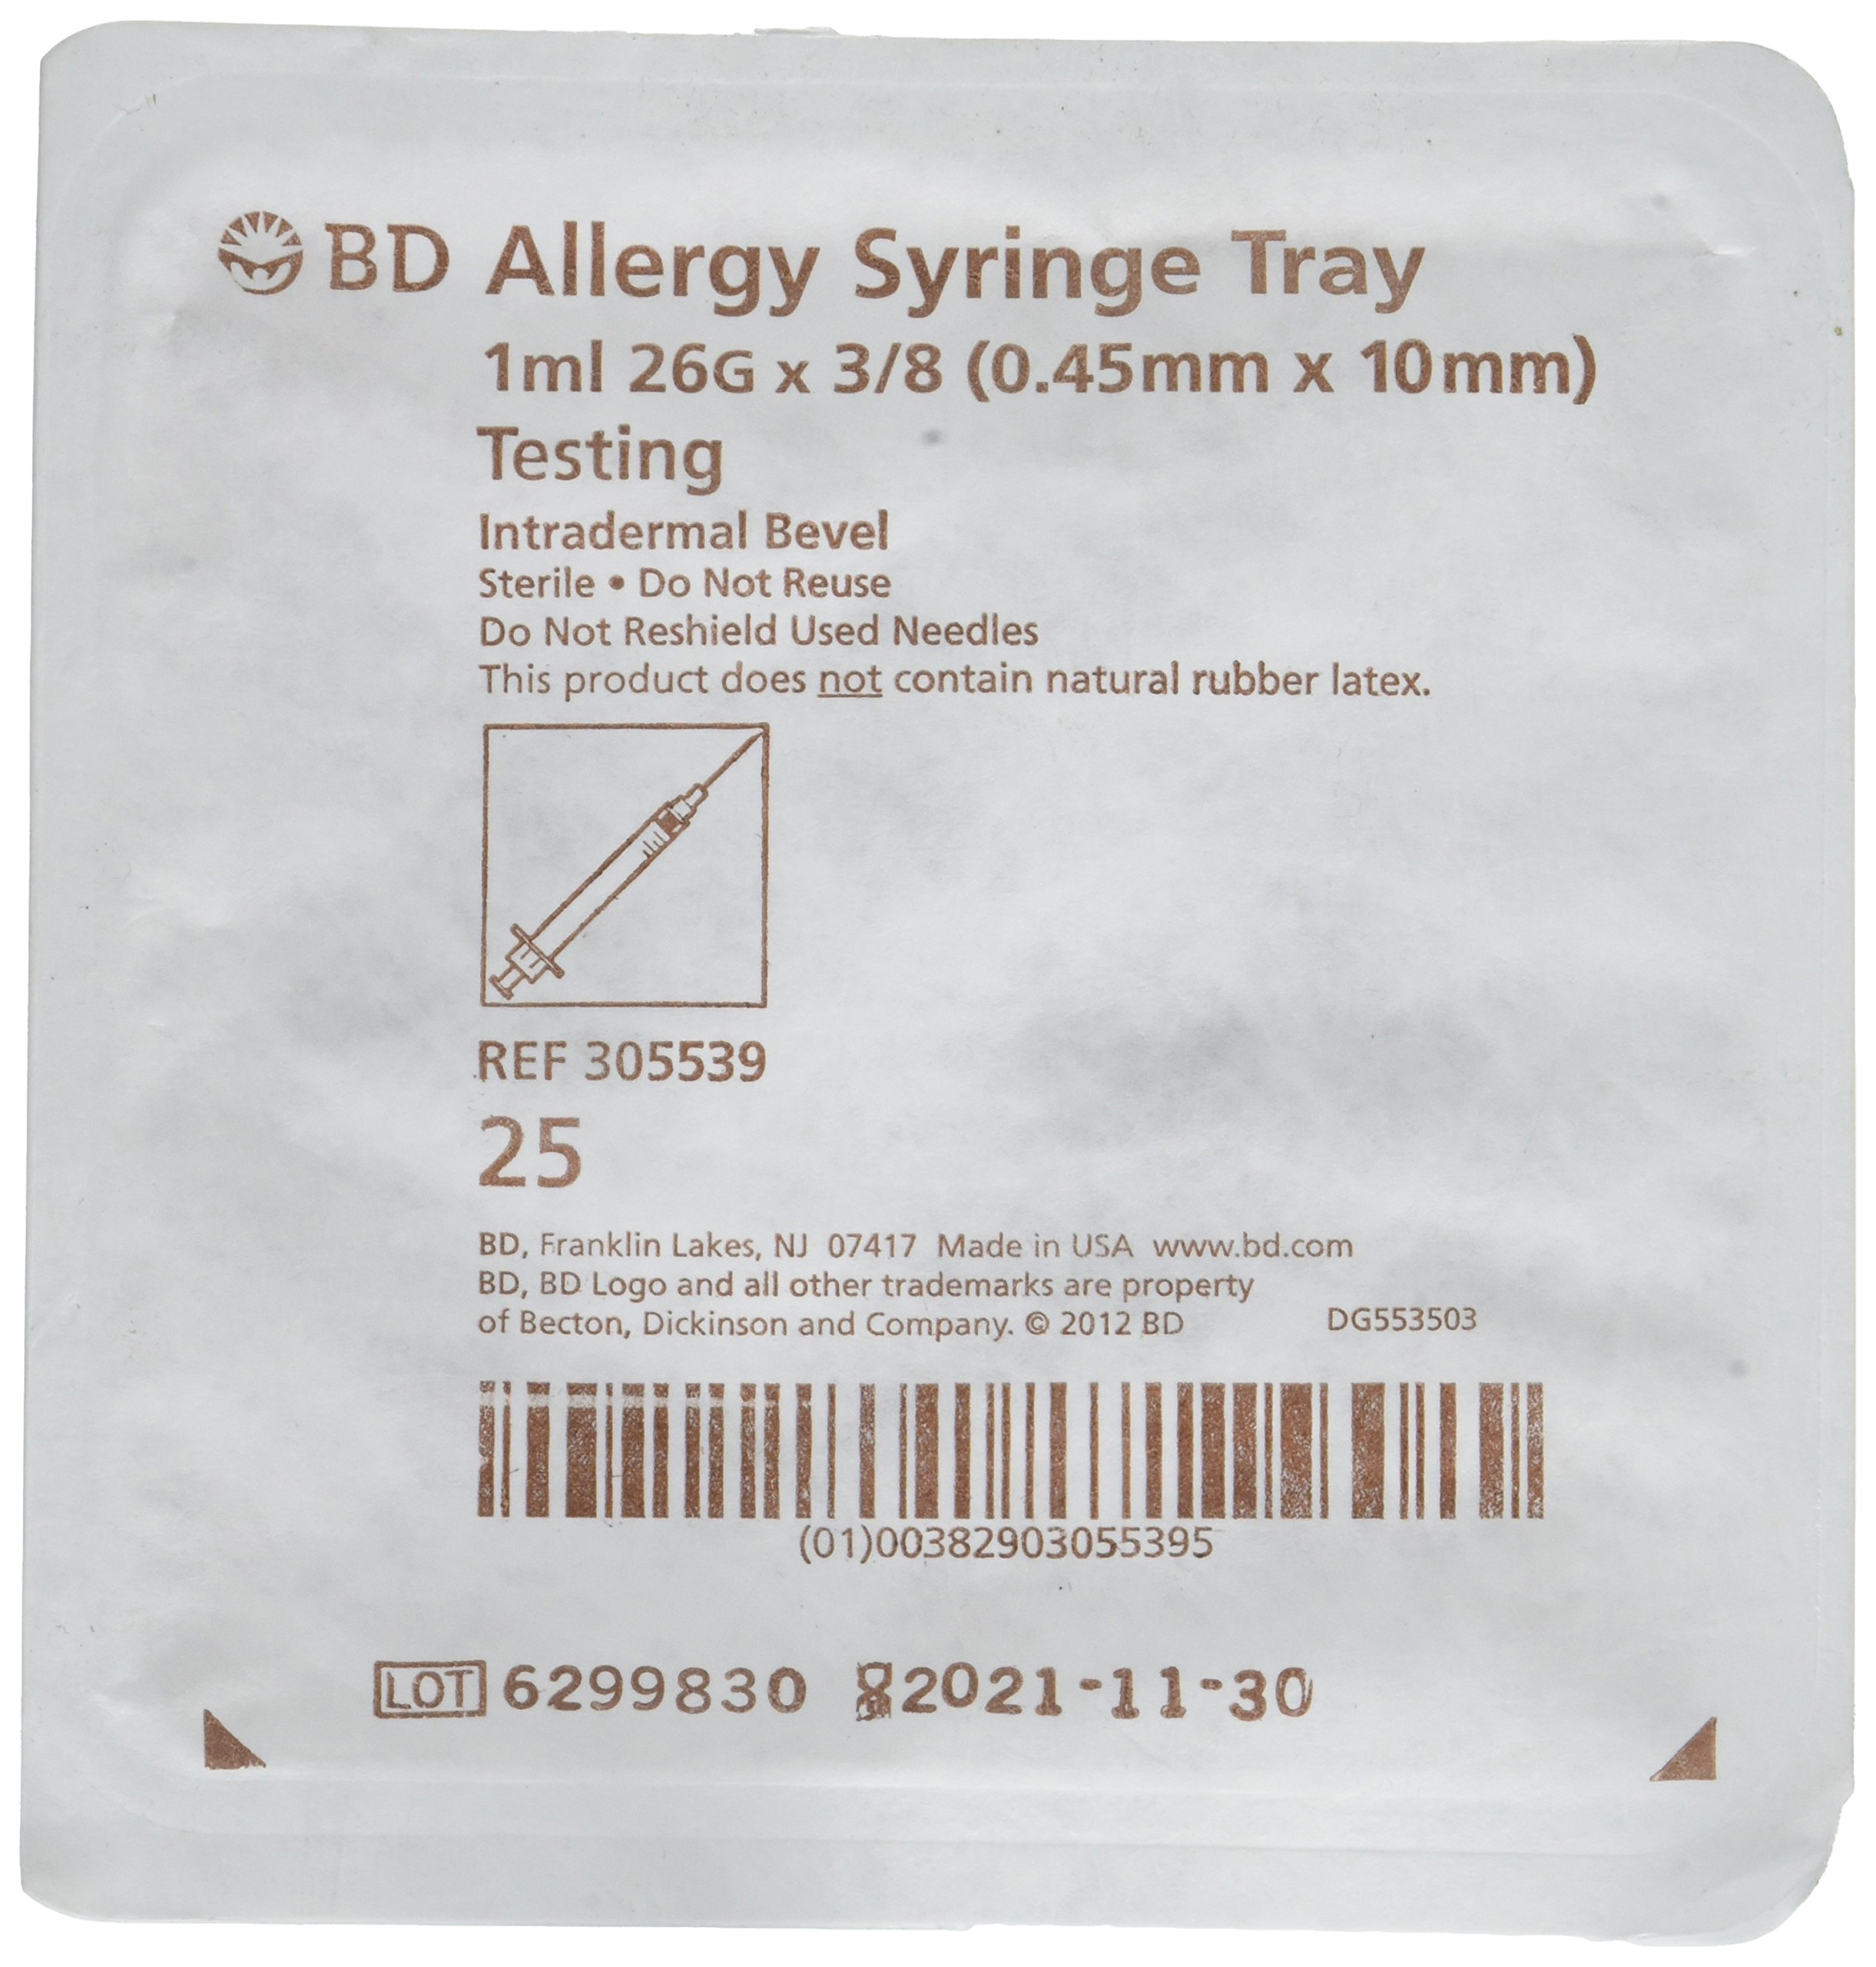 Bd Allergy Syringe Testing Tray 1ml 26g X 3/8 Pack of 25 (305539) Intradermal Bevel